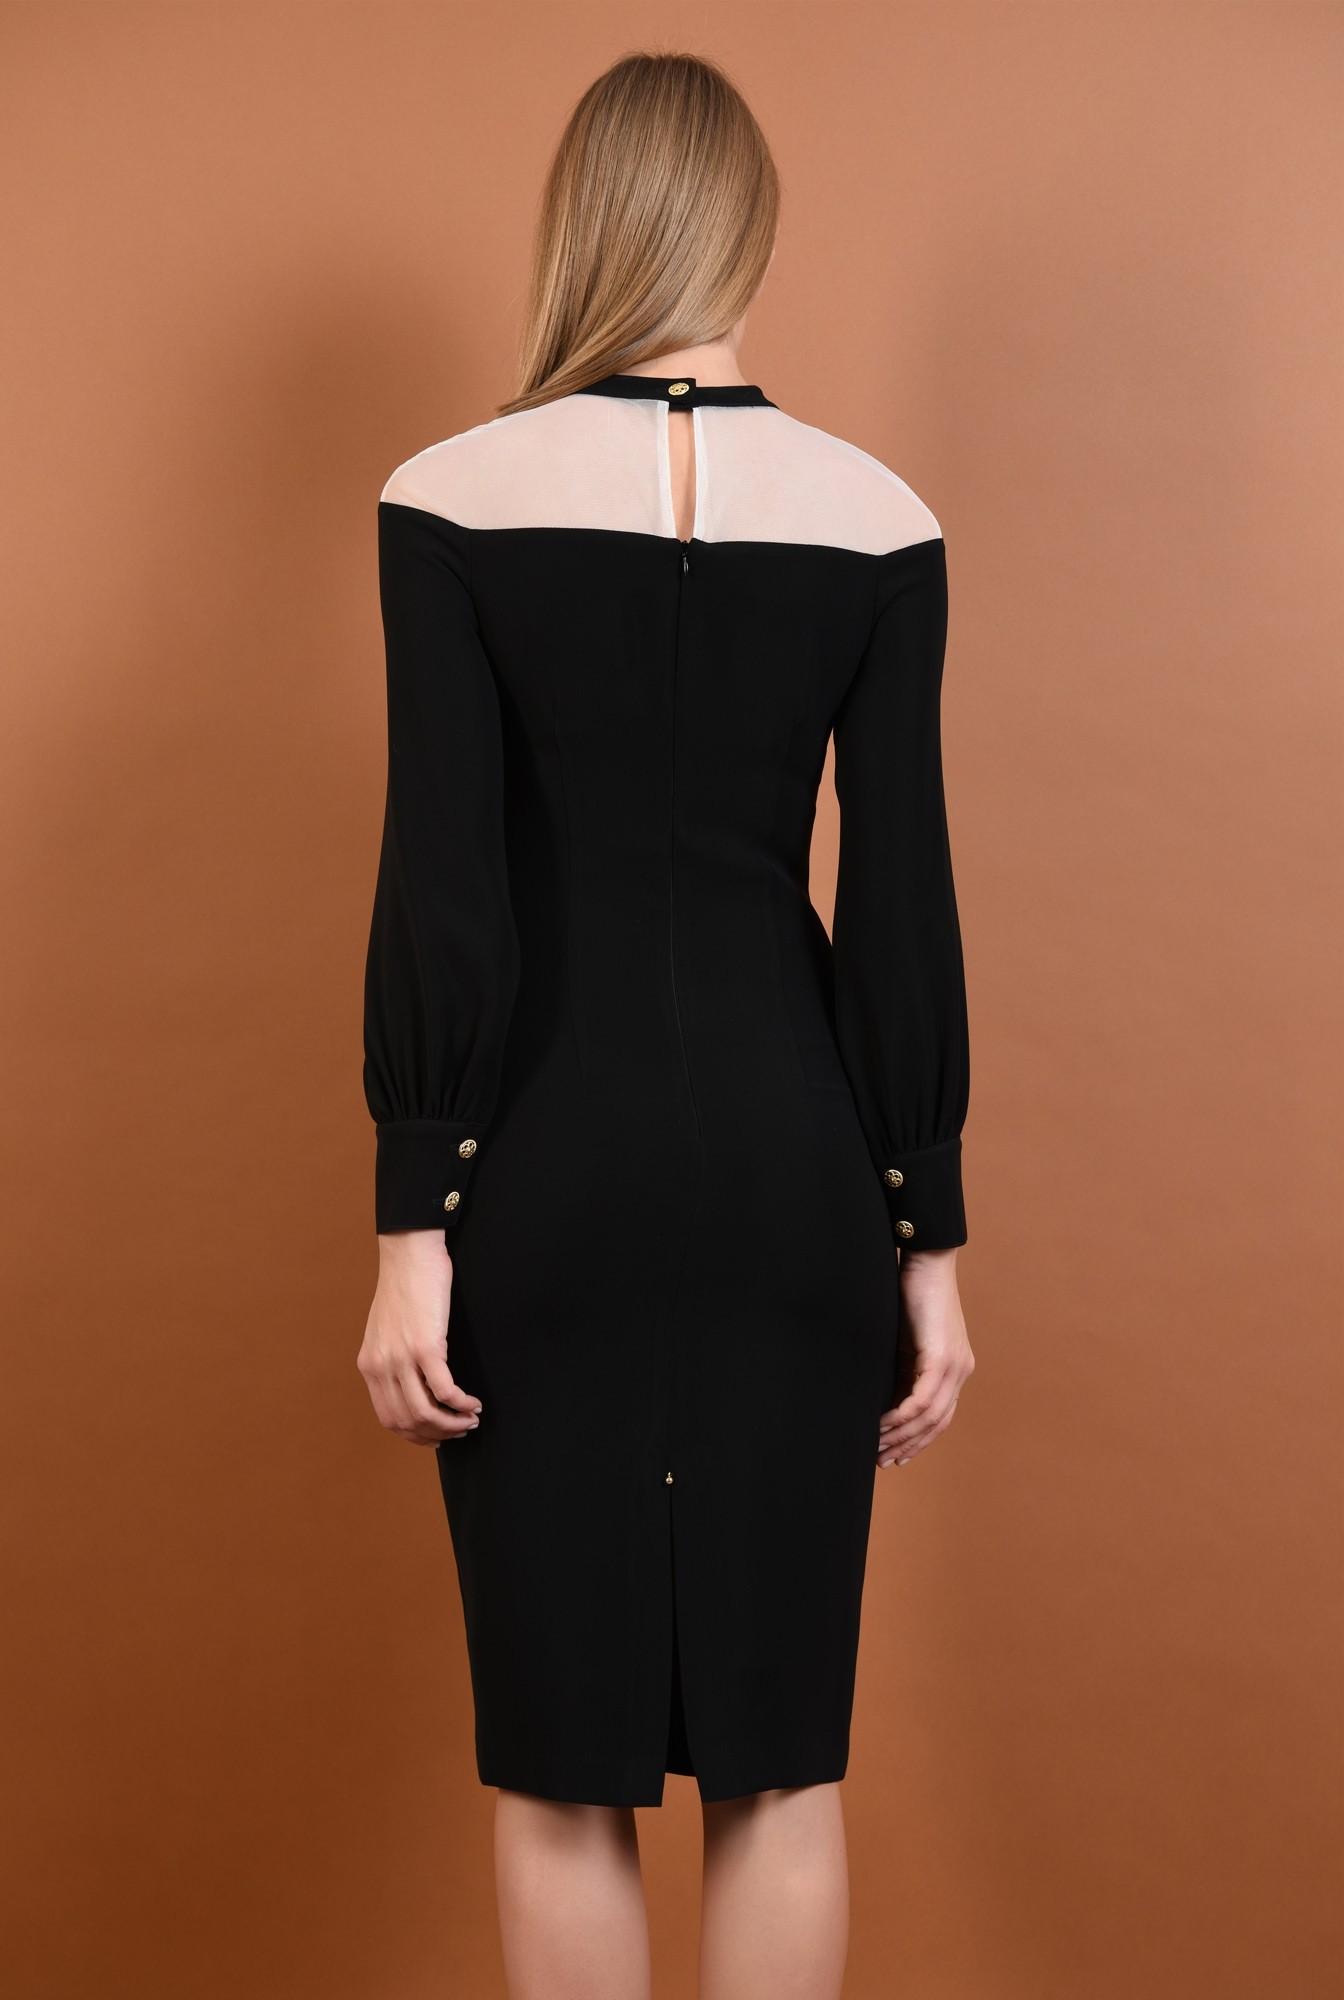 1 - 360 - rochie eleganta, midi, conica, neagra, insertie tul, nasturi metalici